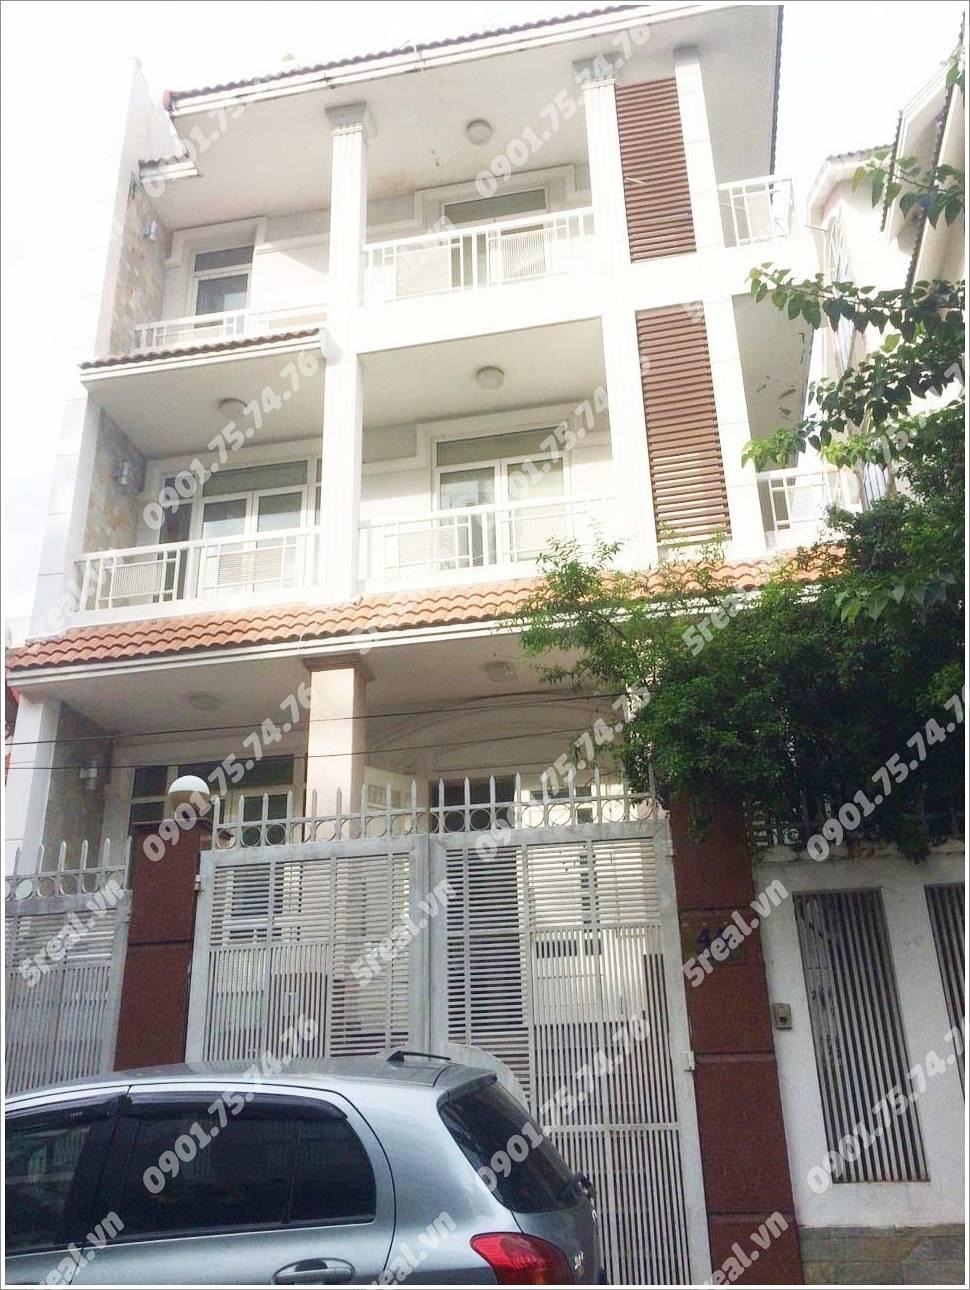 building-44-duong-so-34-tran-nao-quan-2-van-phong-cho-thue-5real.vn-01